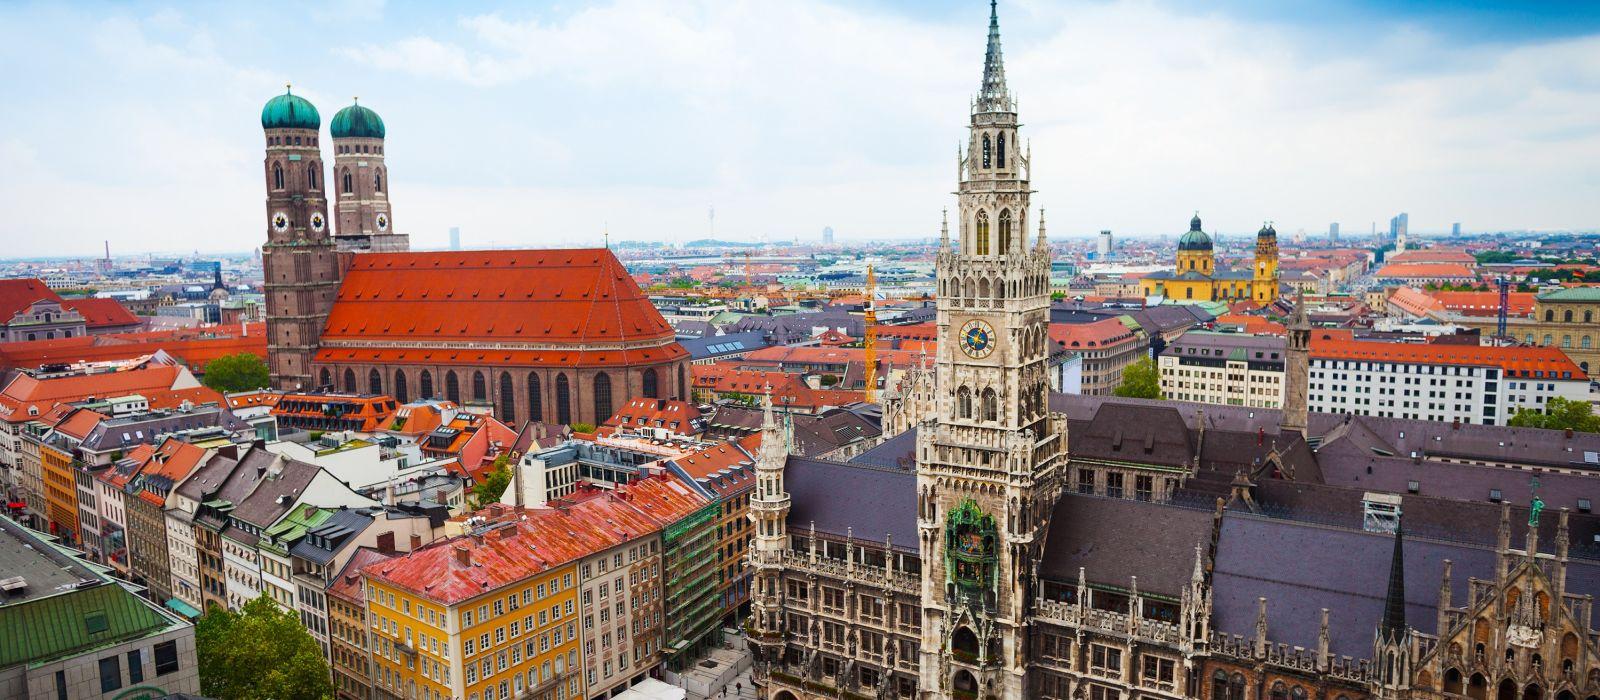 Destination Munich Germany